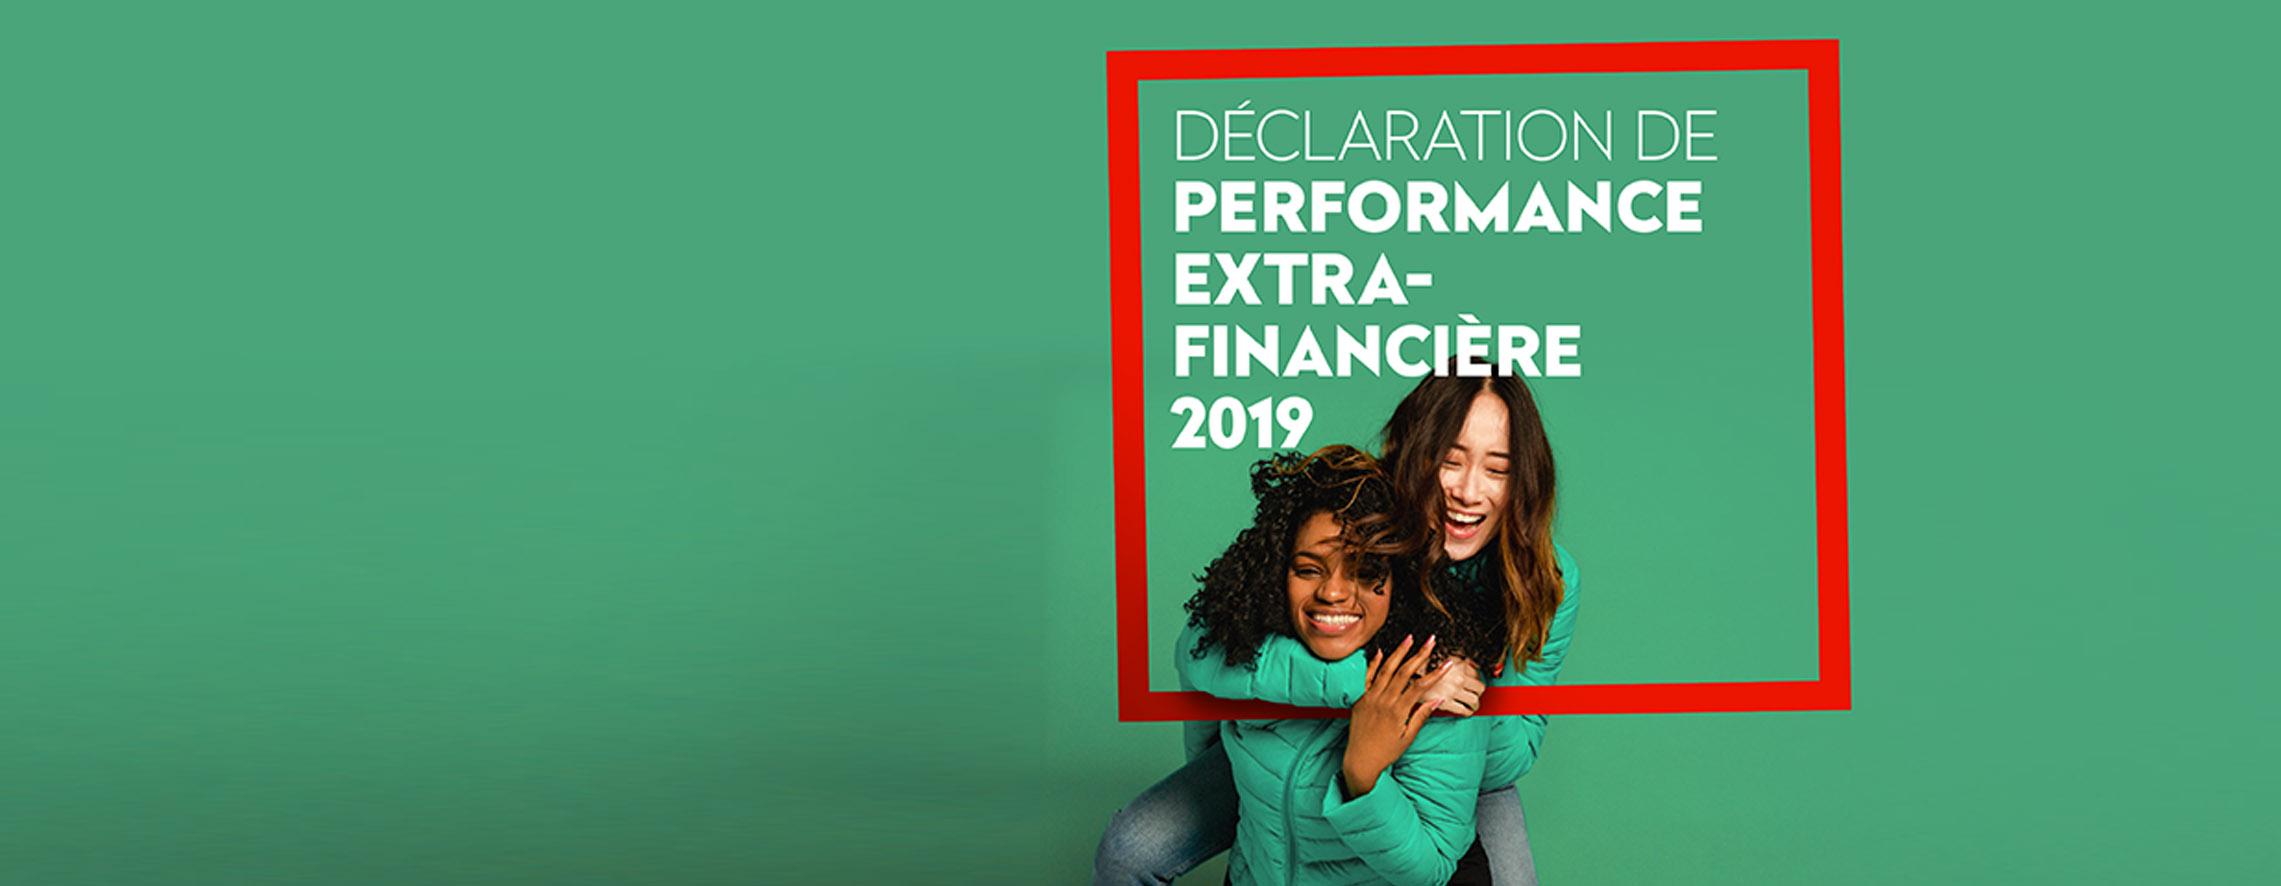 Nos <b>données extra-financières 2019 </b>